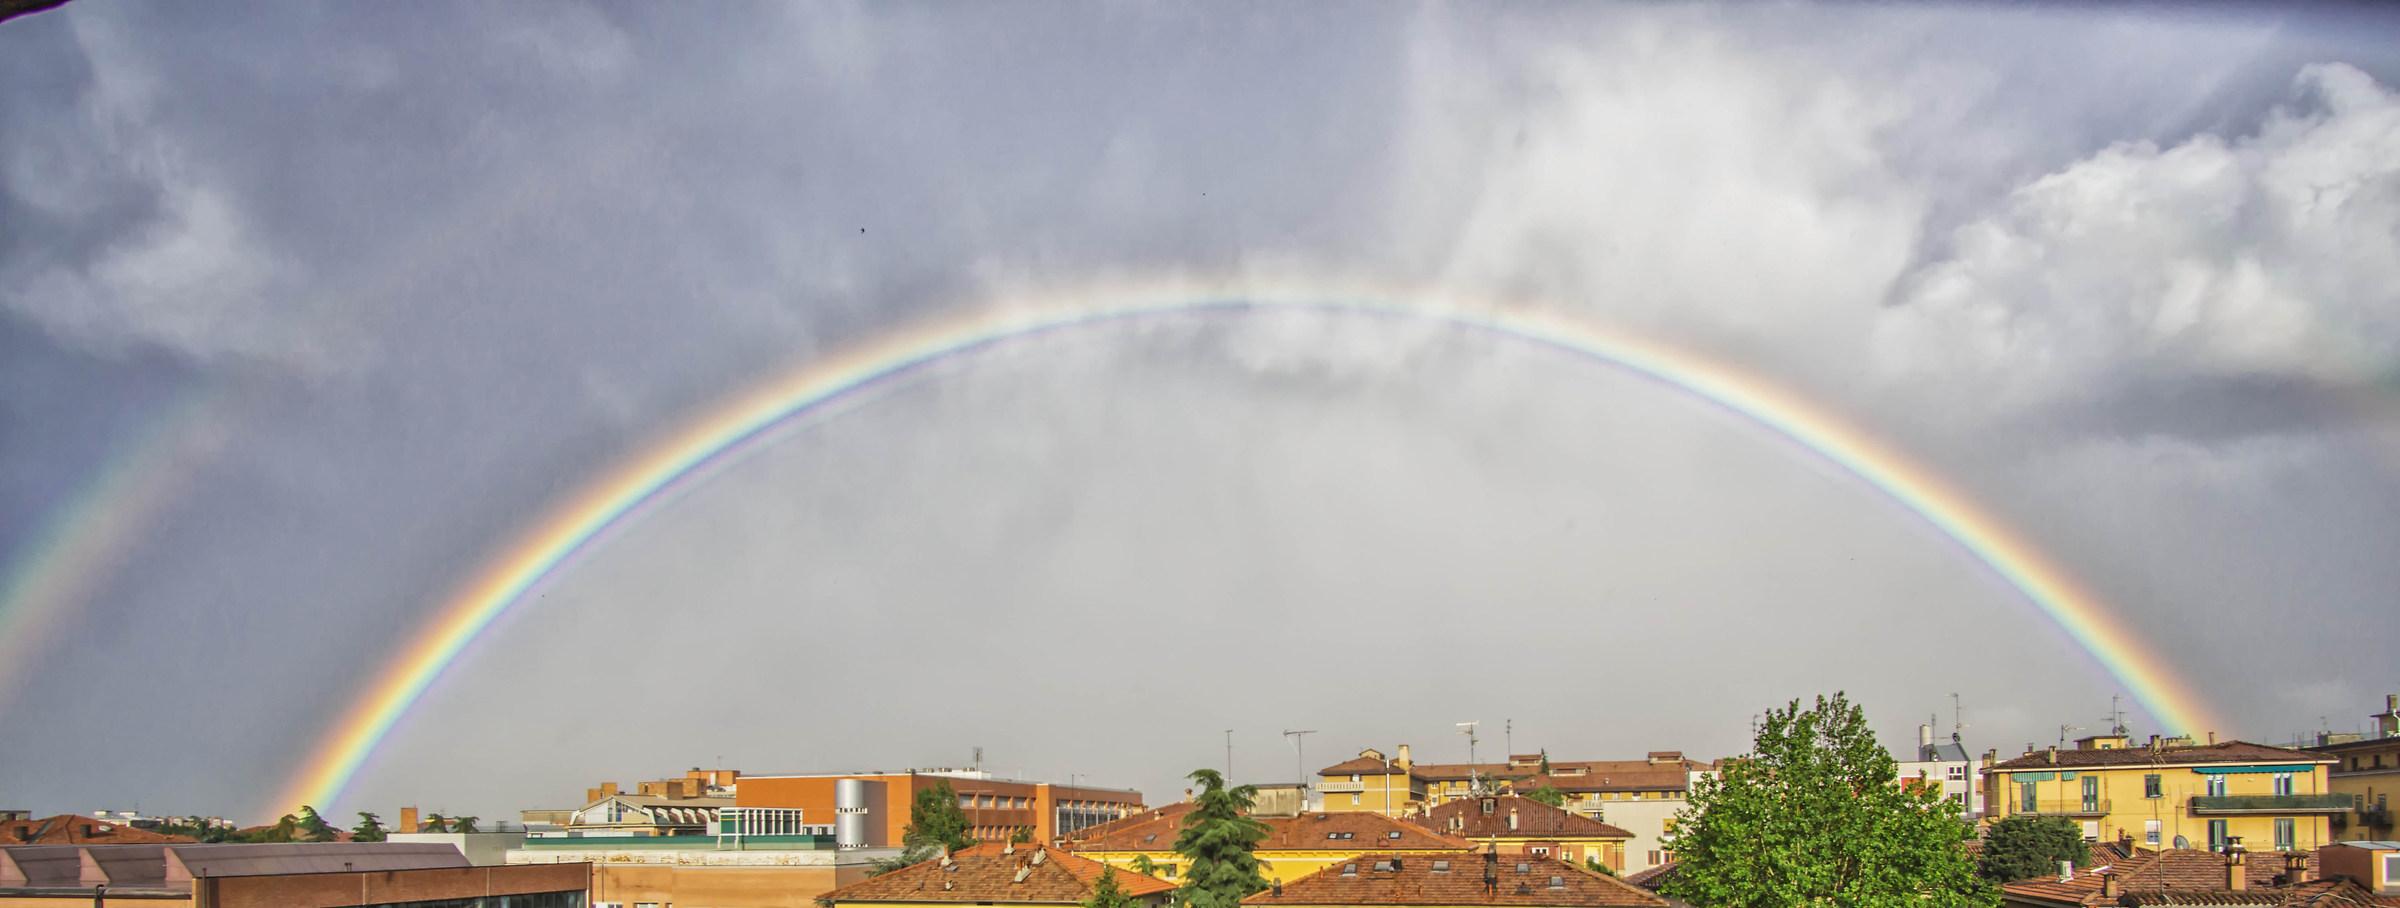 Below the rainbow...